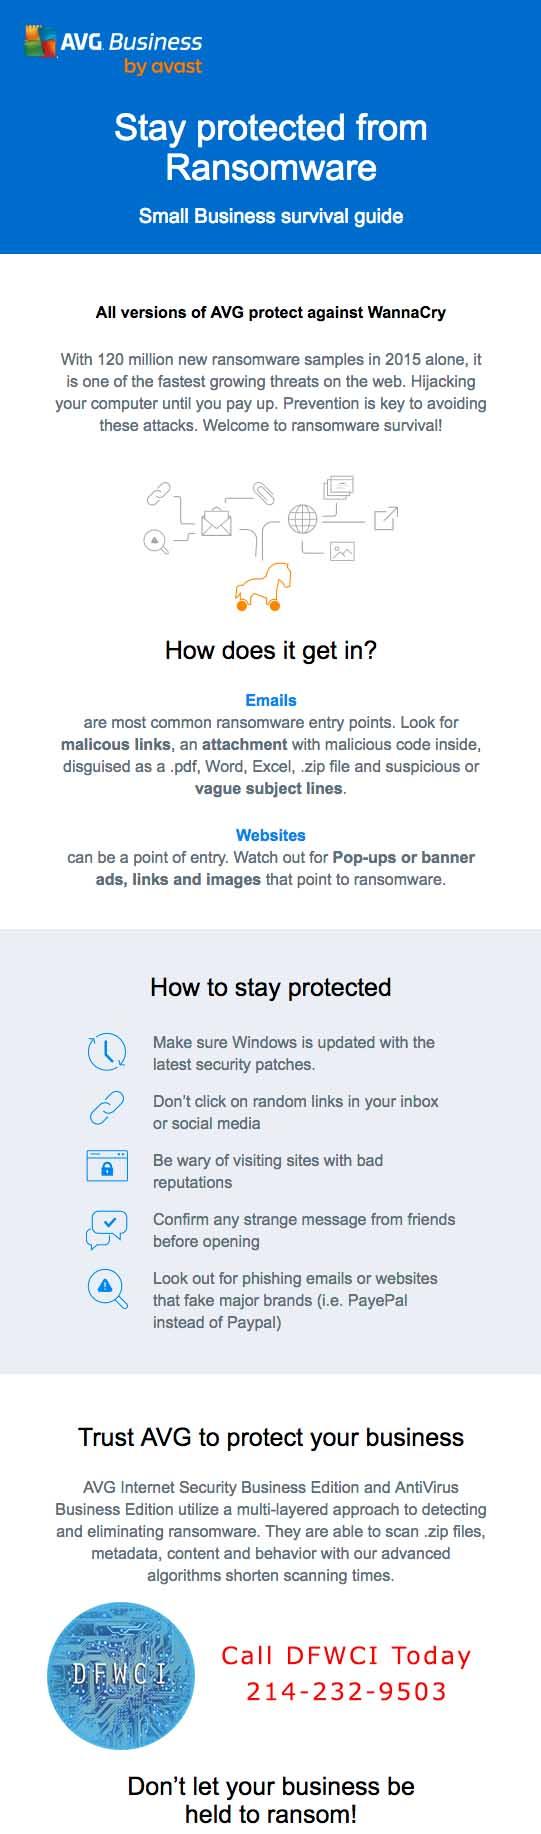 AVG Protects You Against WannaCry